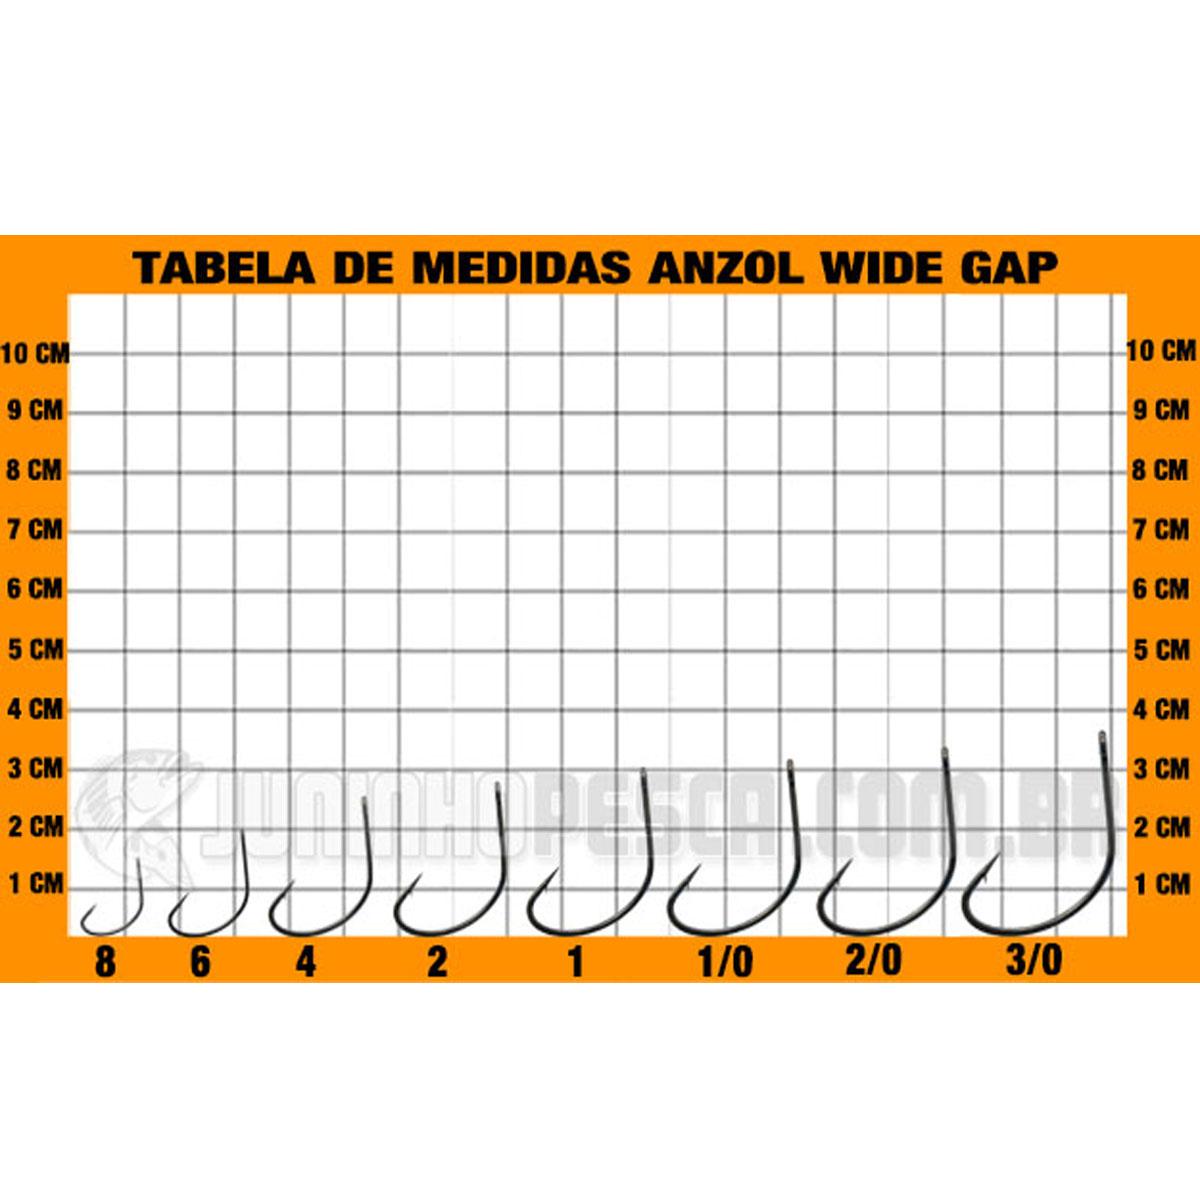 Anzol Pinnacle Wide Gap nº 04  - Pró Pesca Shop